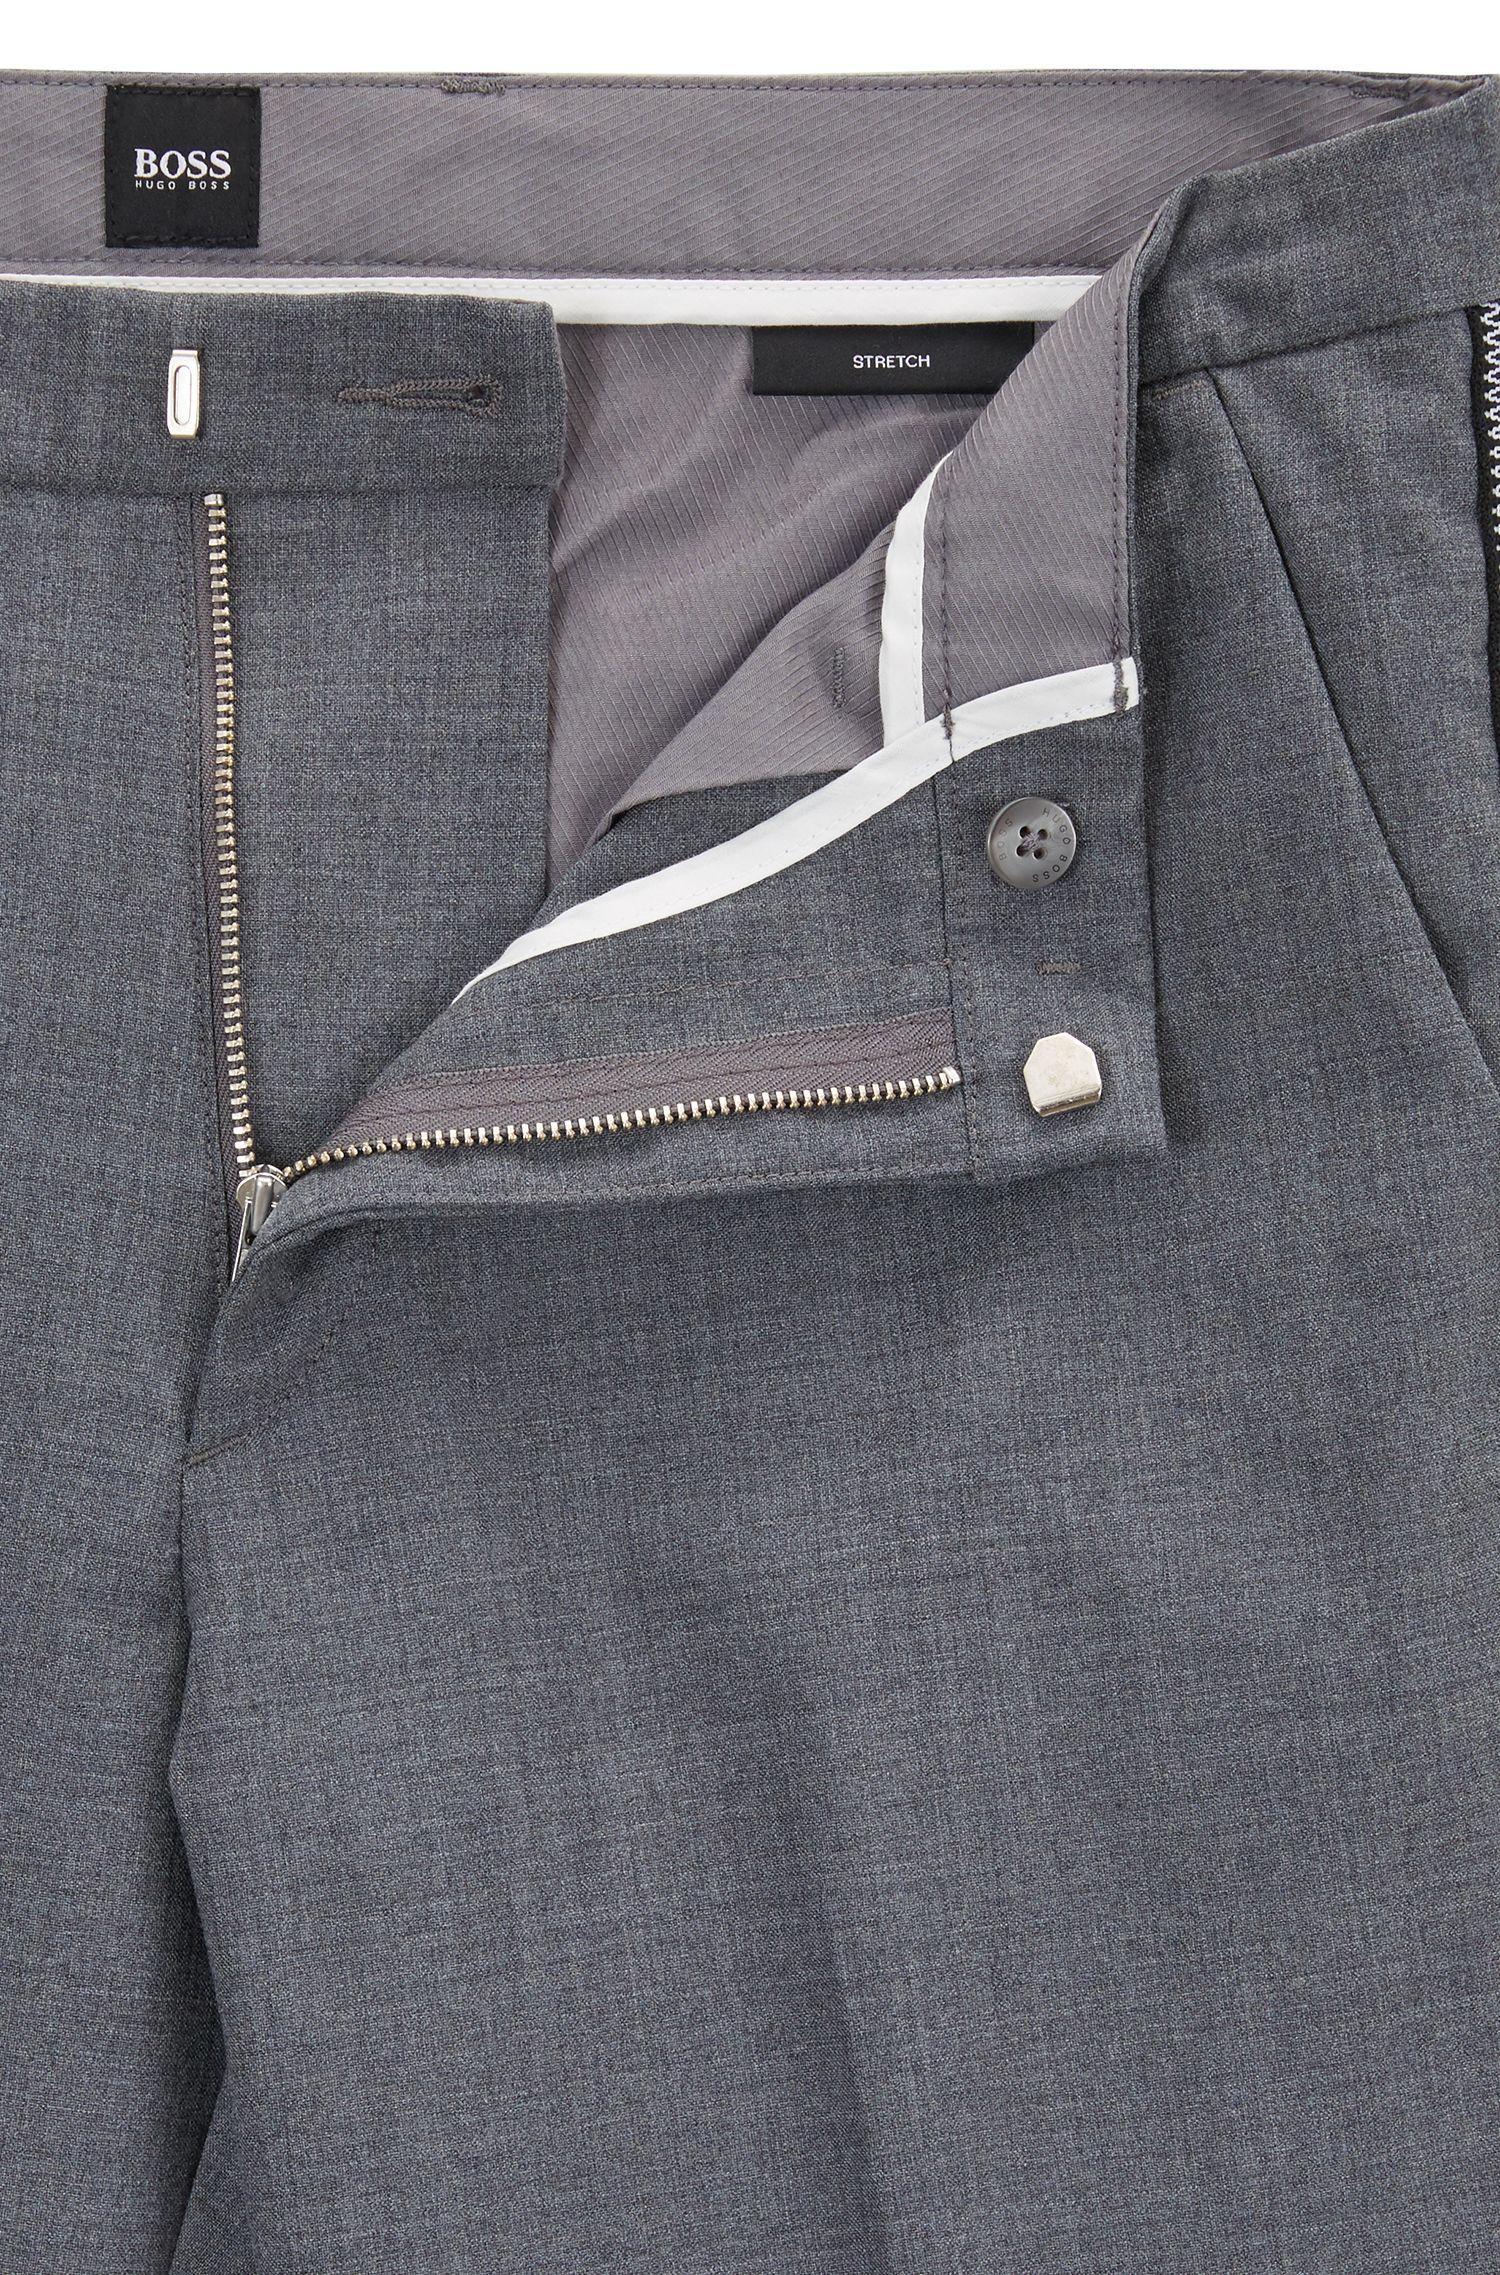 Hugo Boss - Chino Slim Fit en tissu stretch mercerisé - 4